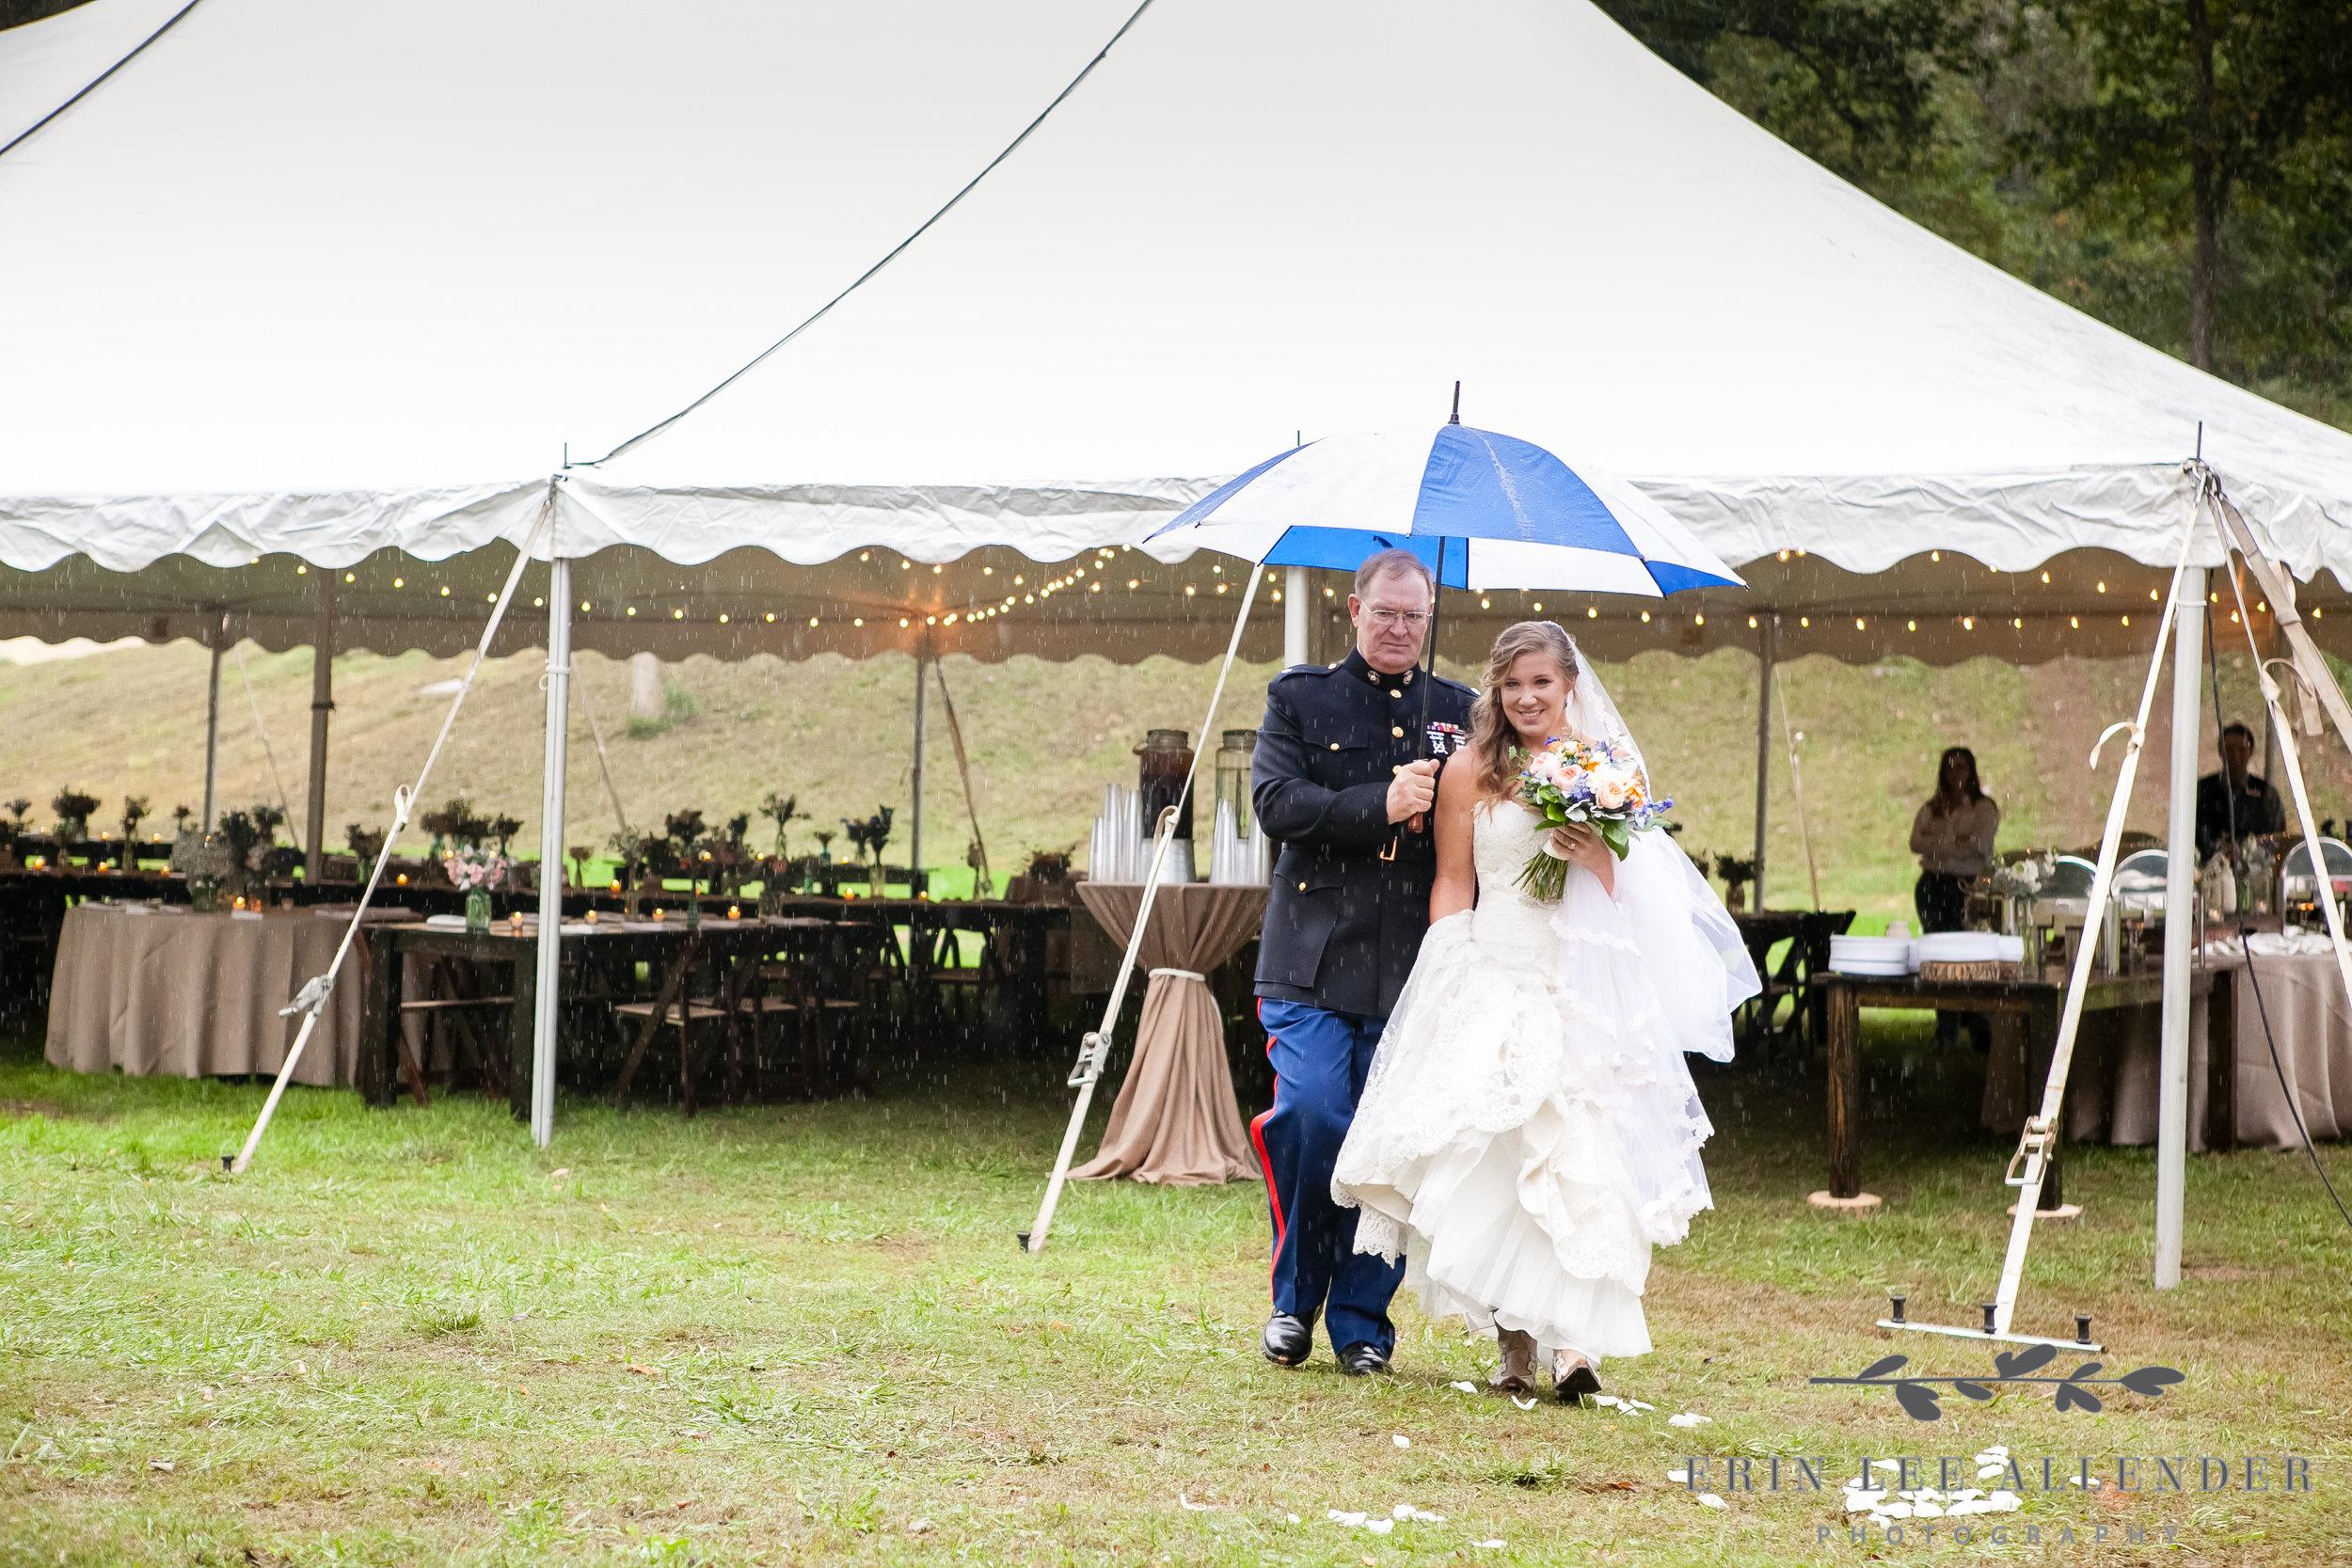 Bride_Walks_Down_The_Aisle_In_The_Rain